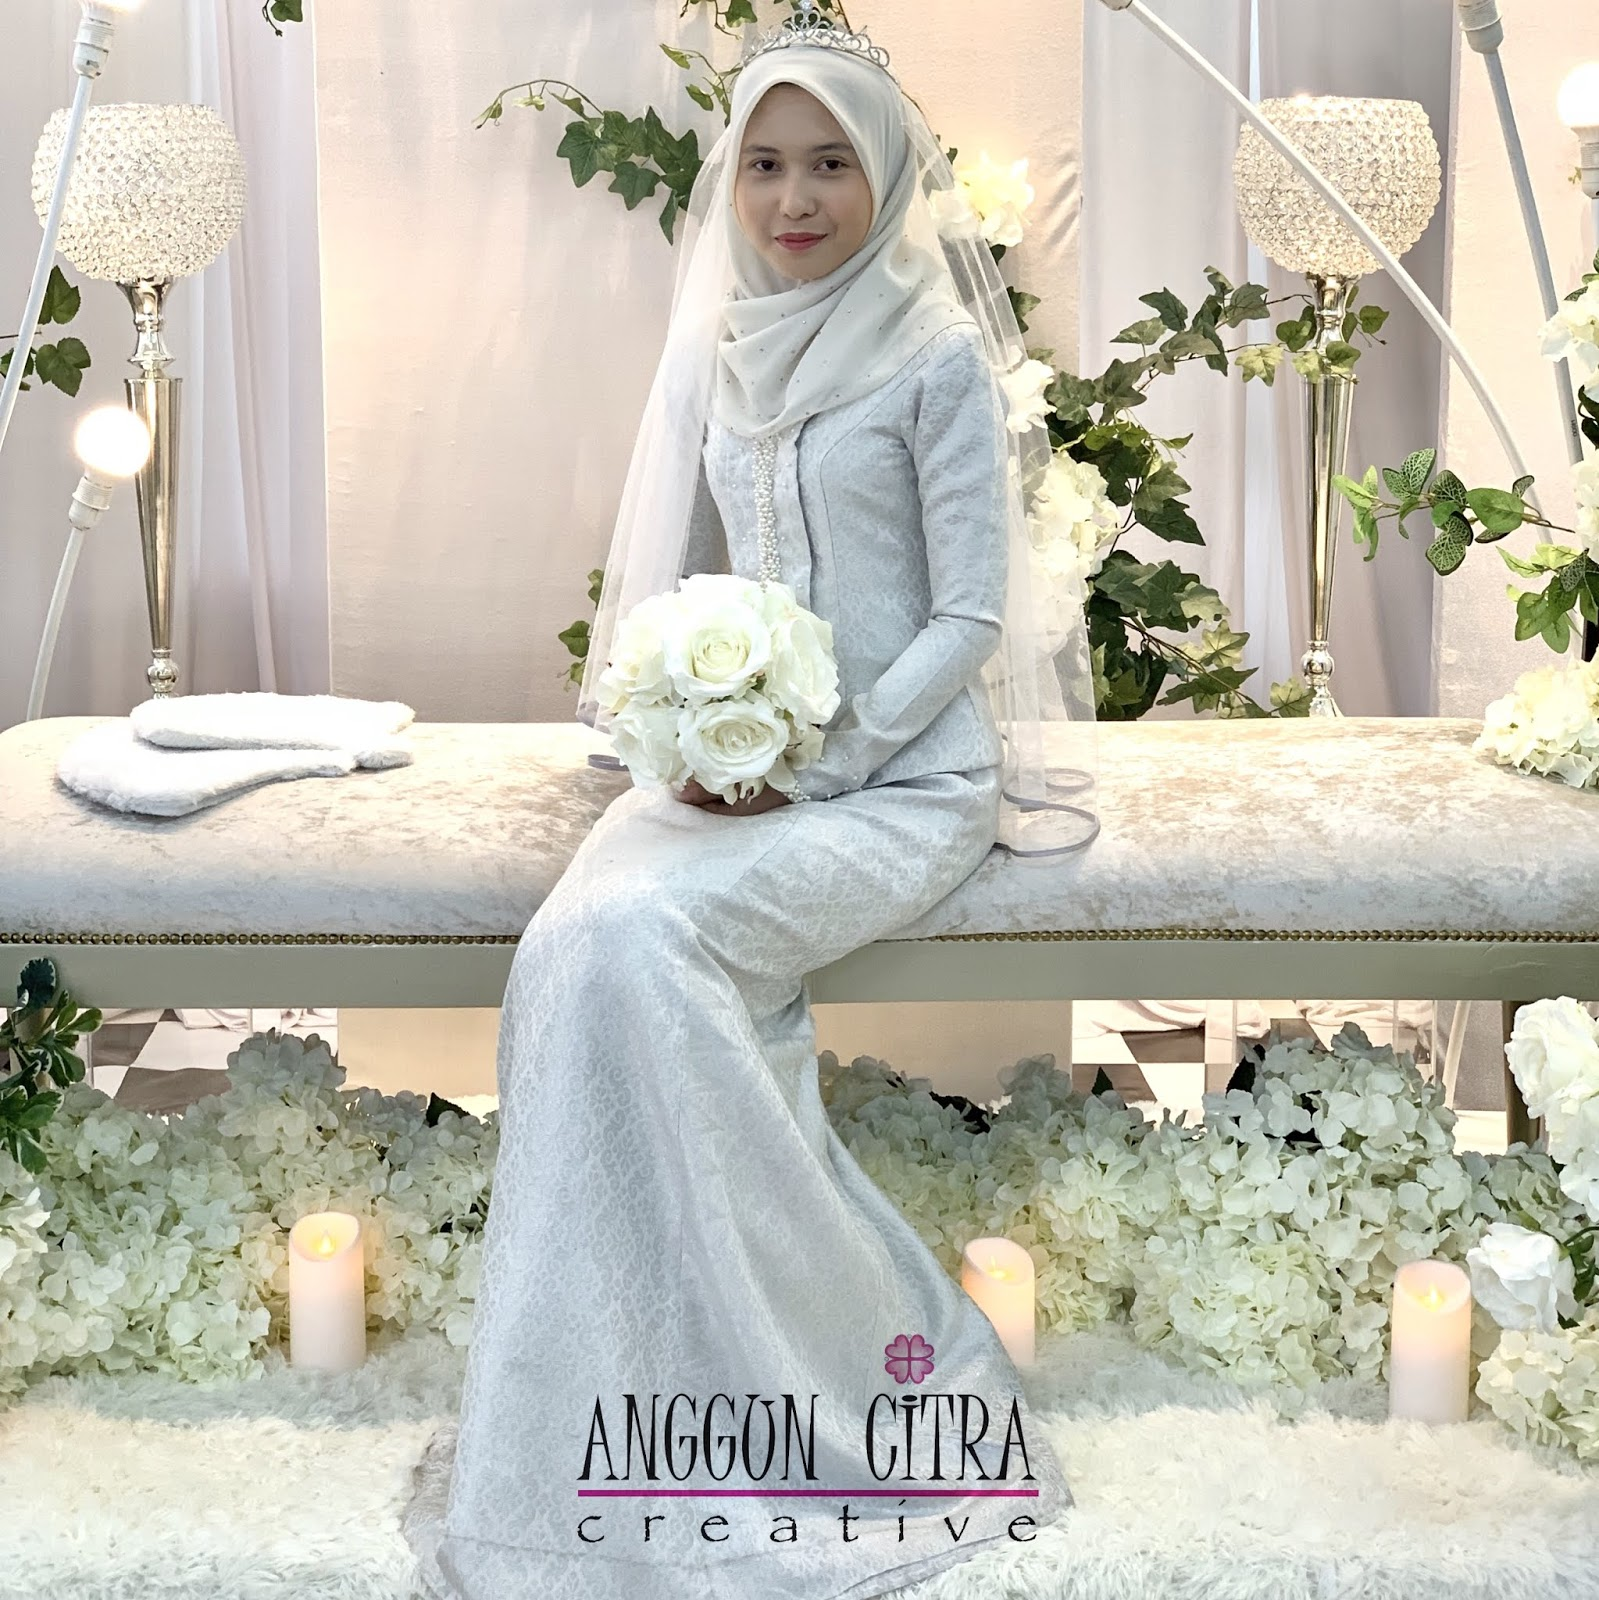 Anggun Citra Creative Wedding Planner - Bridal/ Butik Pengantin